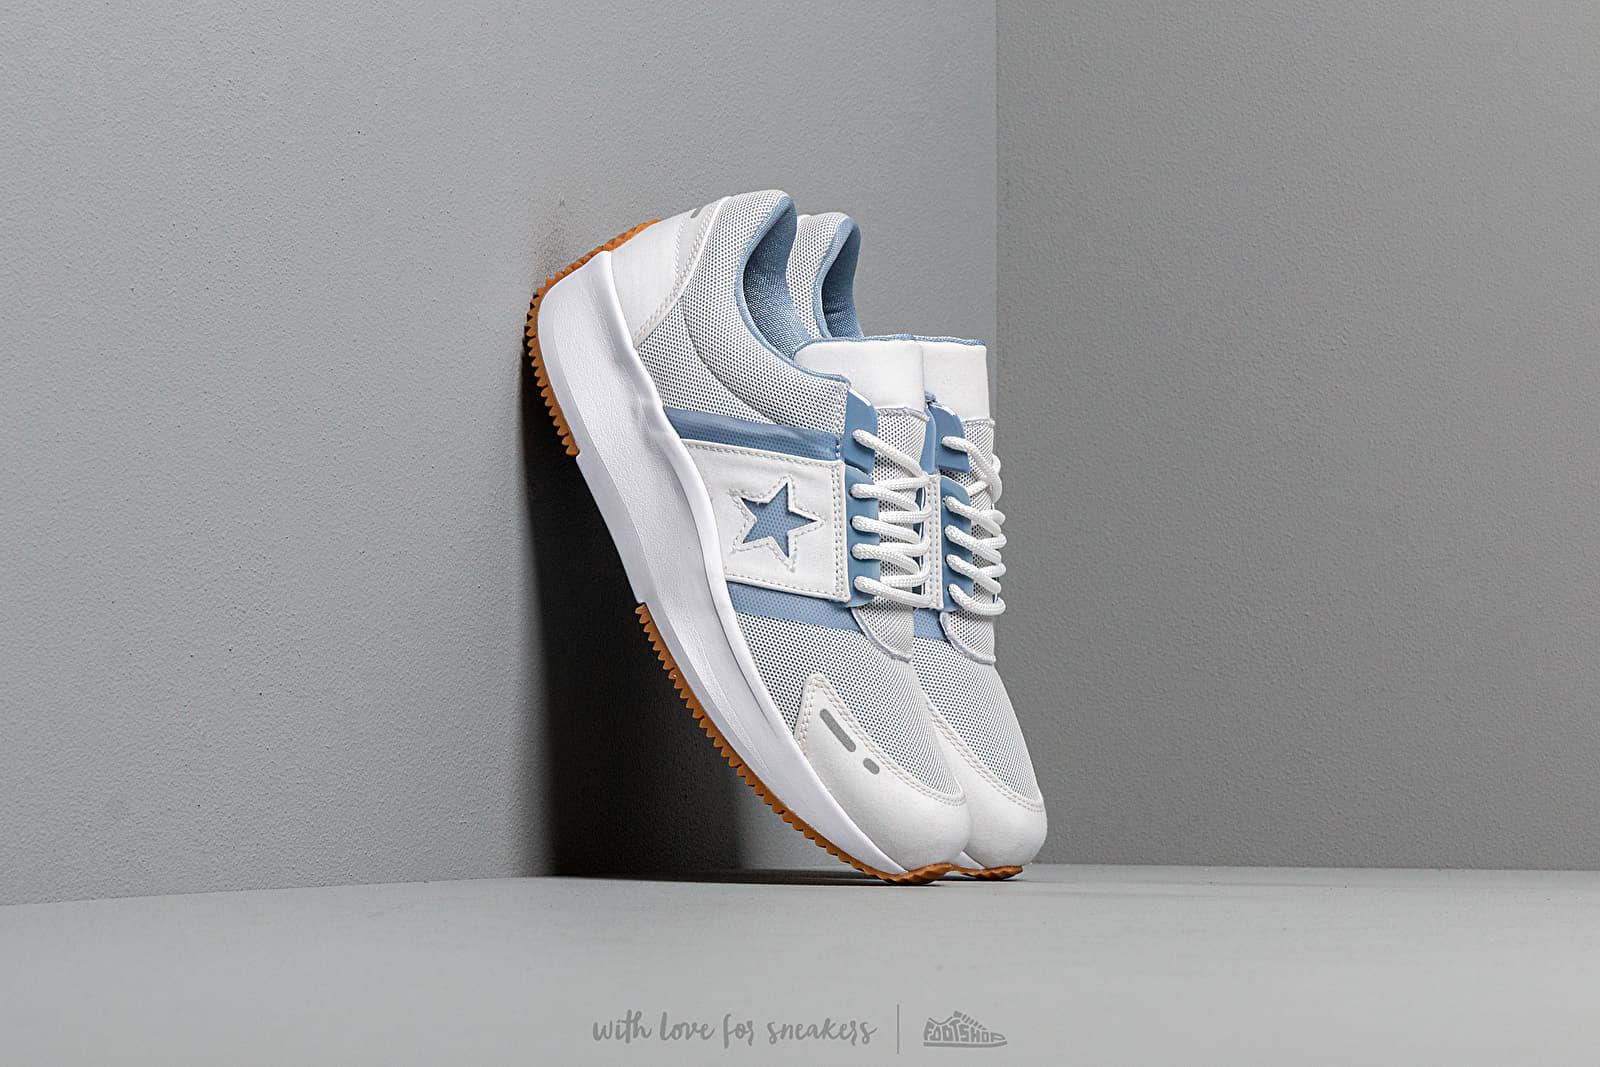 Converse Run Star White/ Indigo Fog/ White za skvělou cenu 2 490 Kč koupíte na Footshop.cz